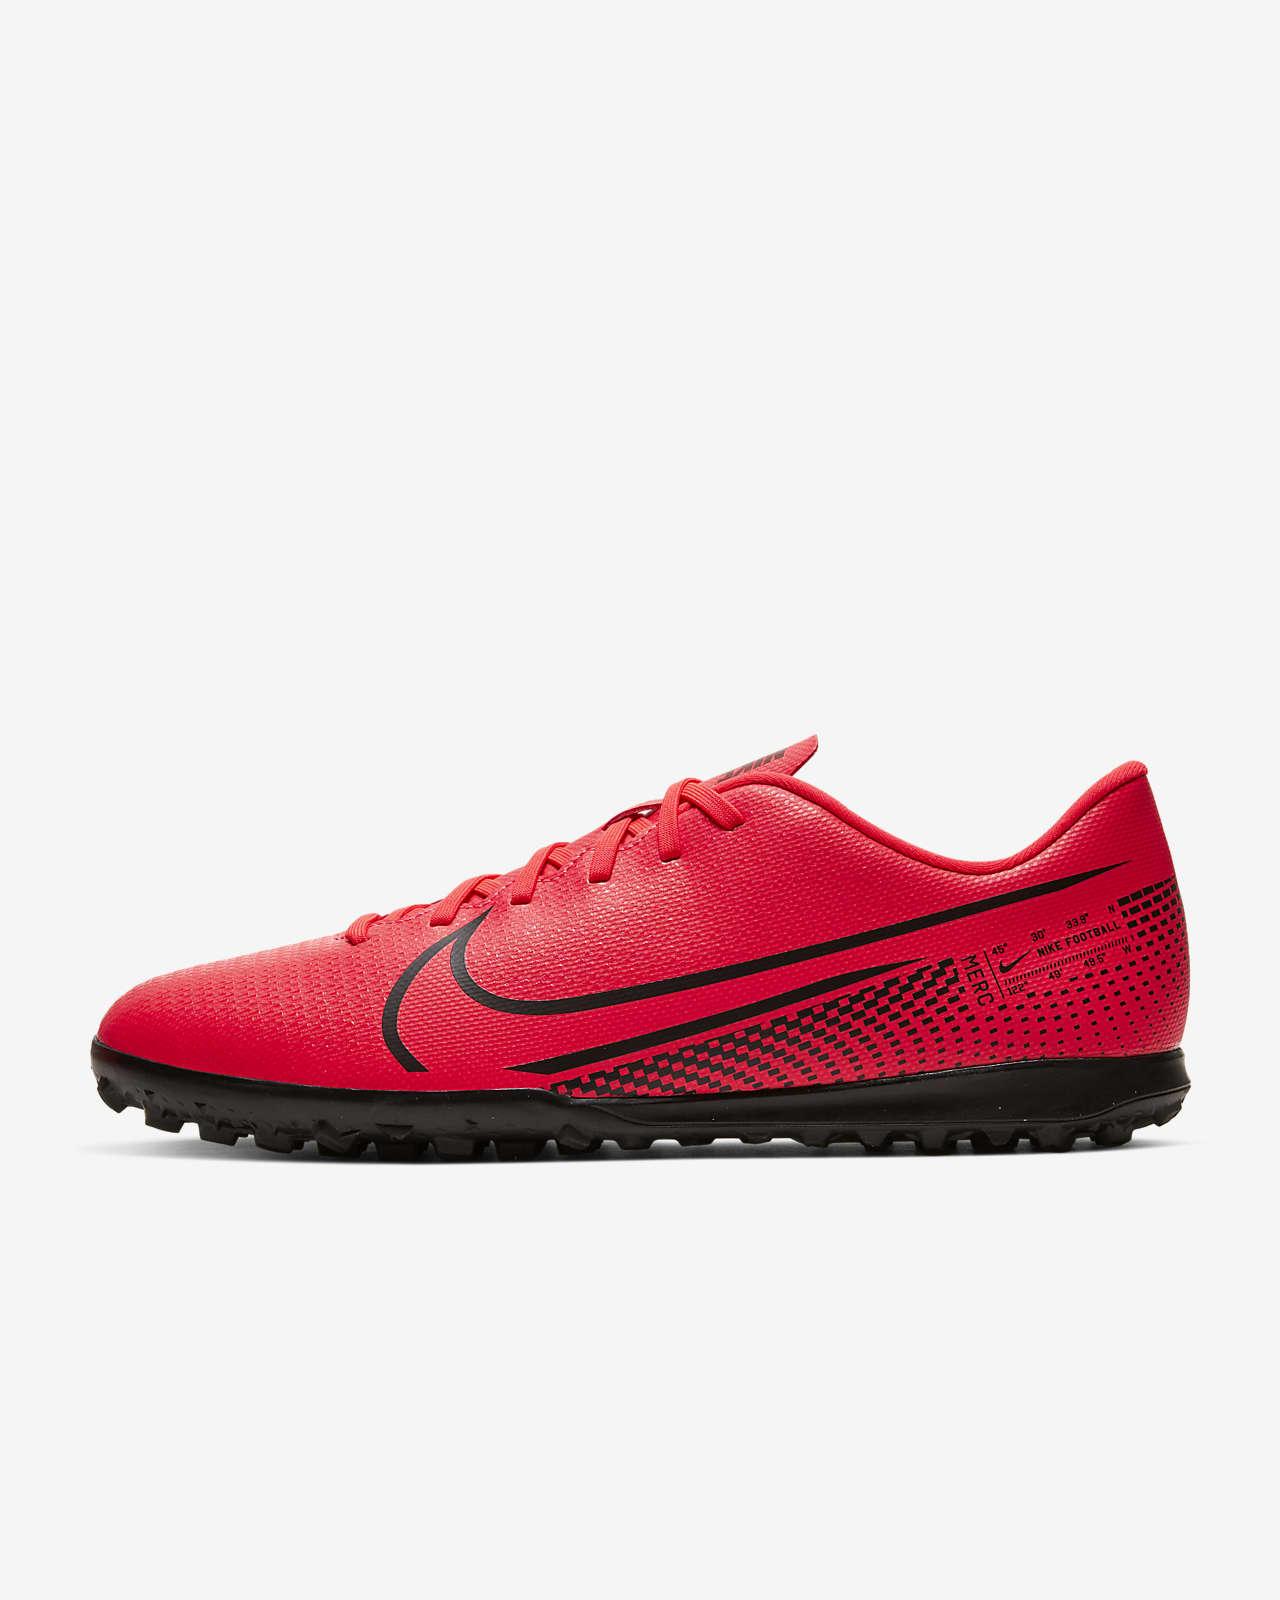 Nike Mercurial Vapor 13 Club TF